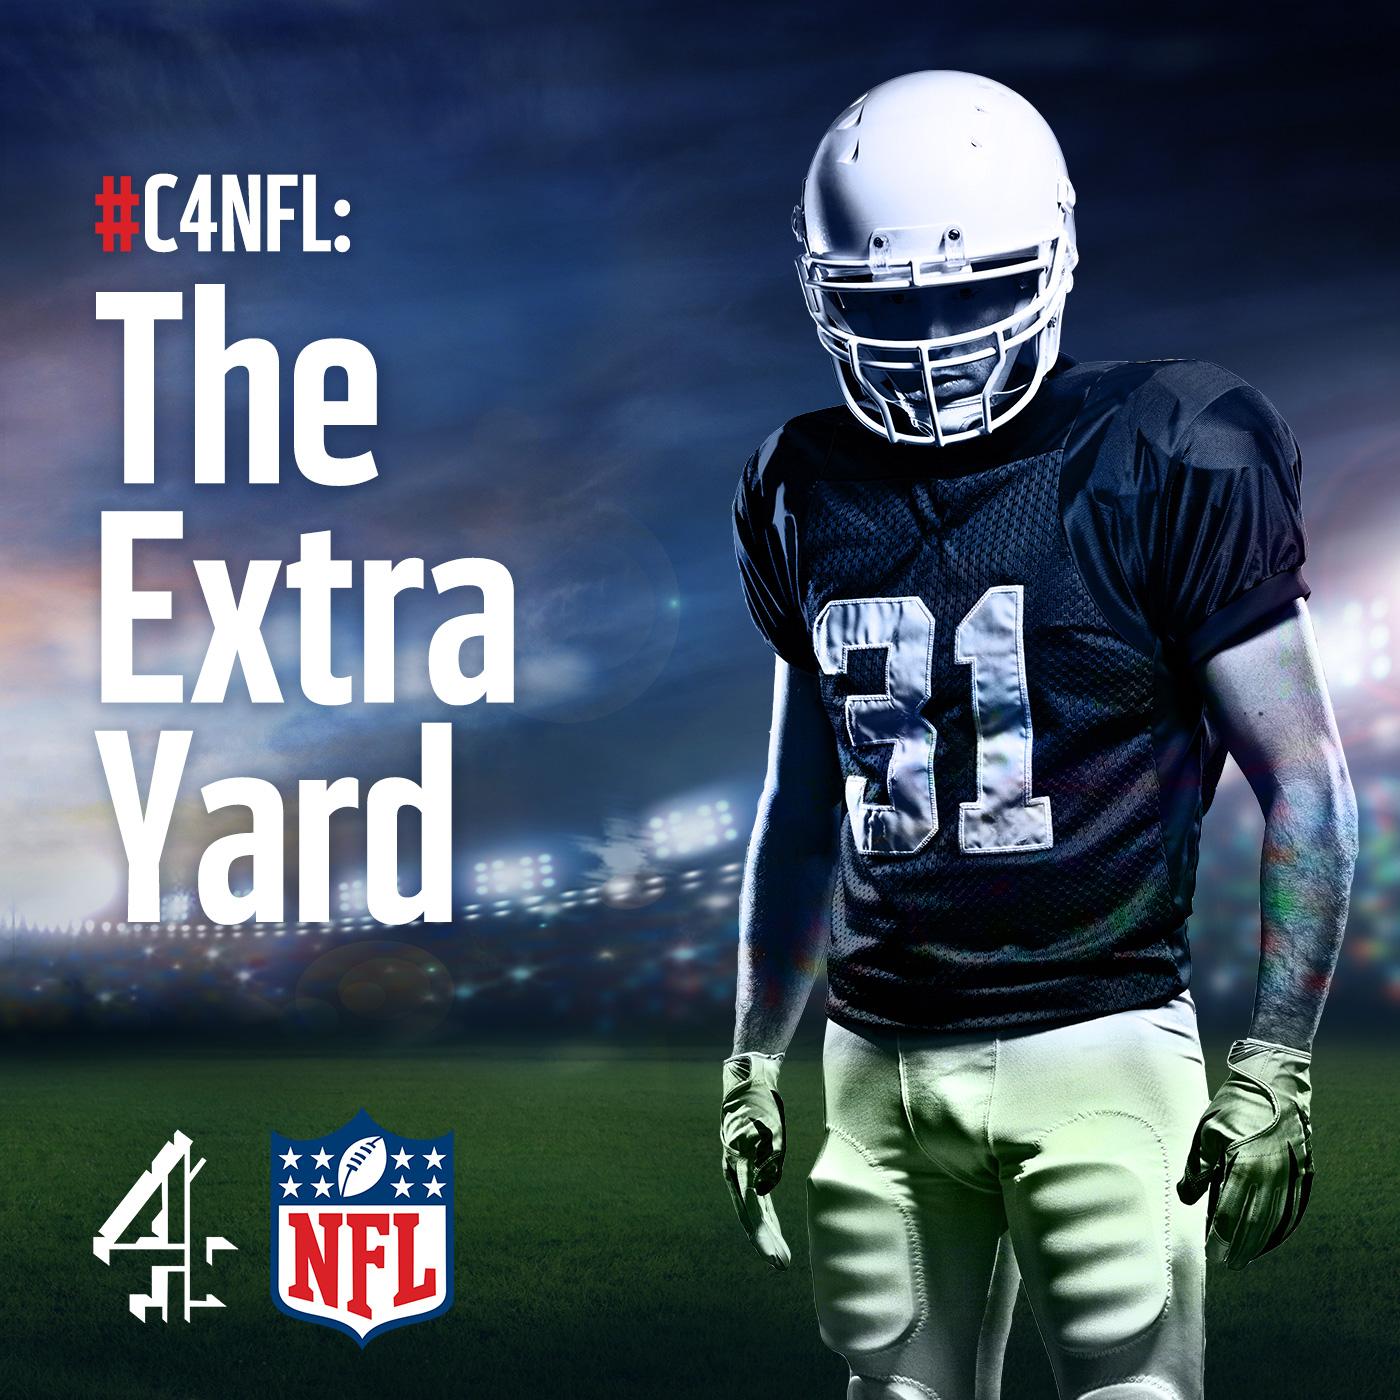 #C4NFL : The Extra Yard